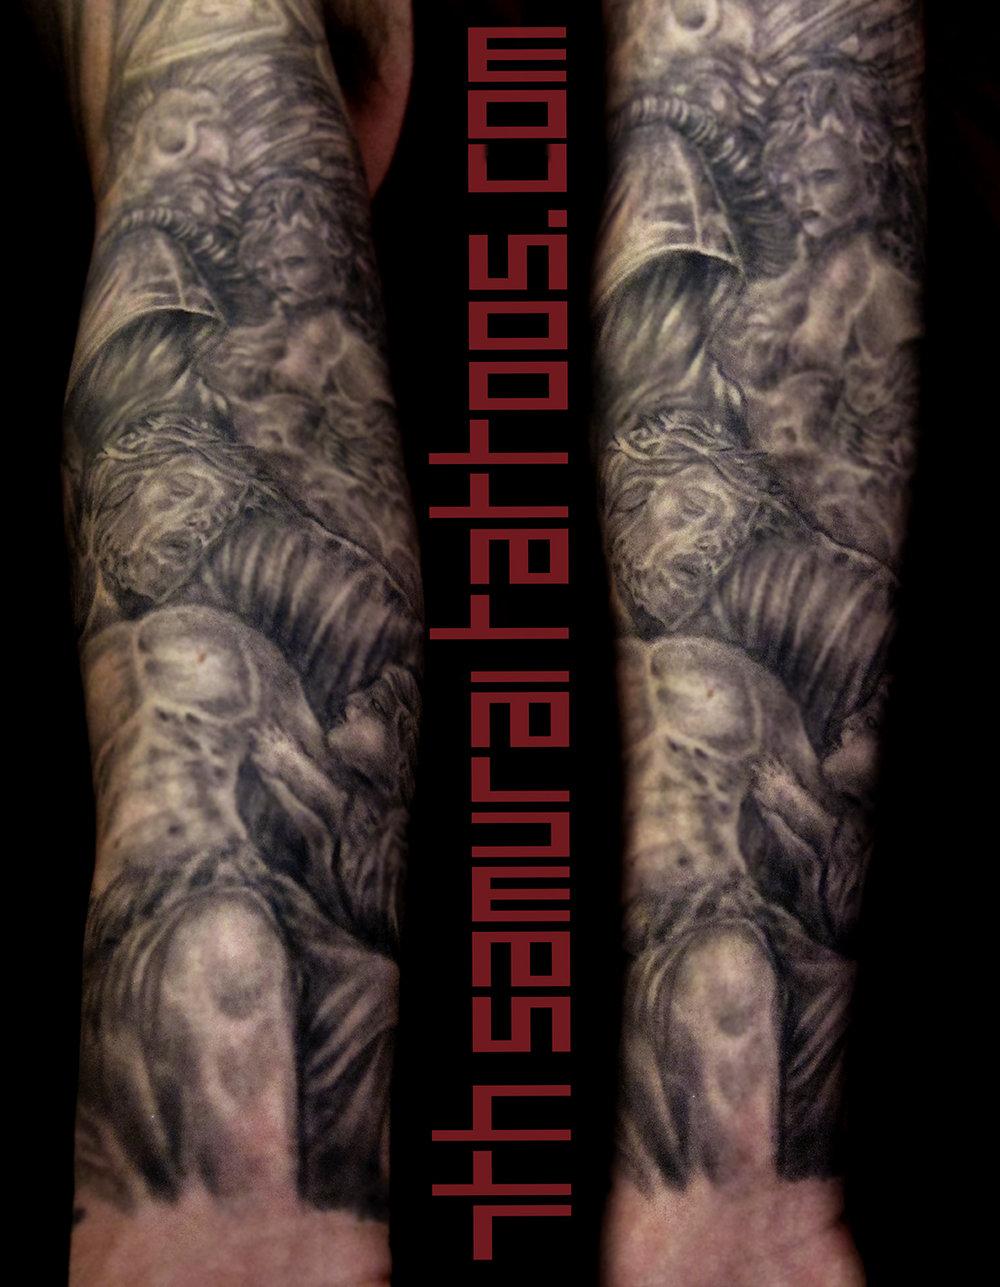 Jesus Statue Cloaked Death Cherubs baby angels Kai 7th Samurai mens arm tattoo